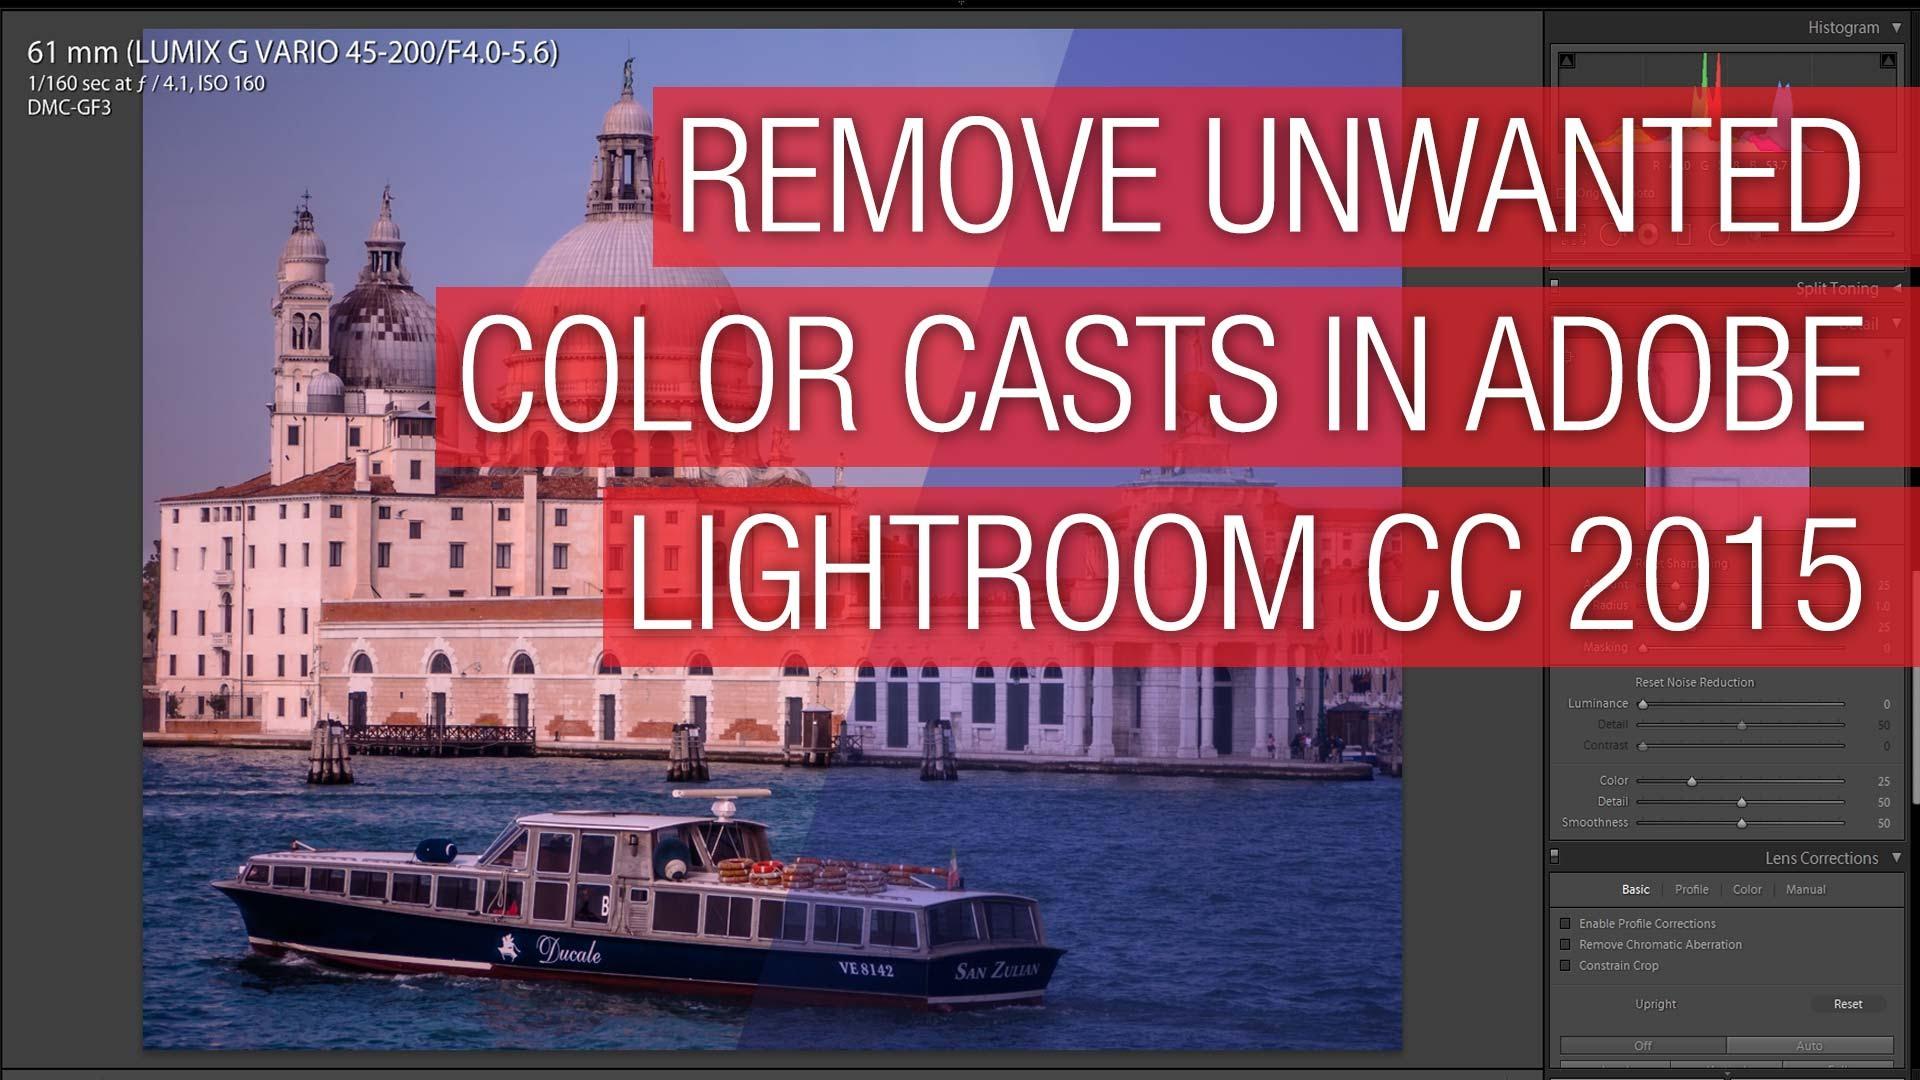 Quickly Remove Color Casts in Adobe Lightroom